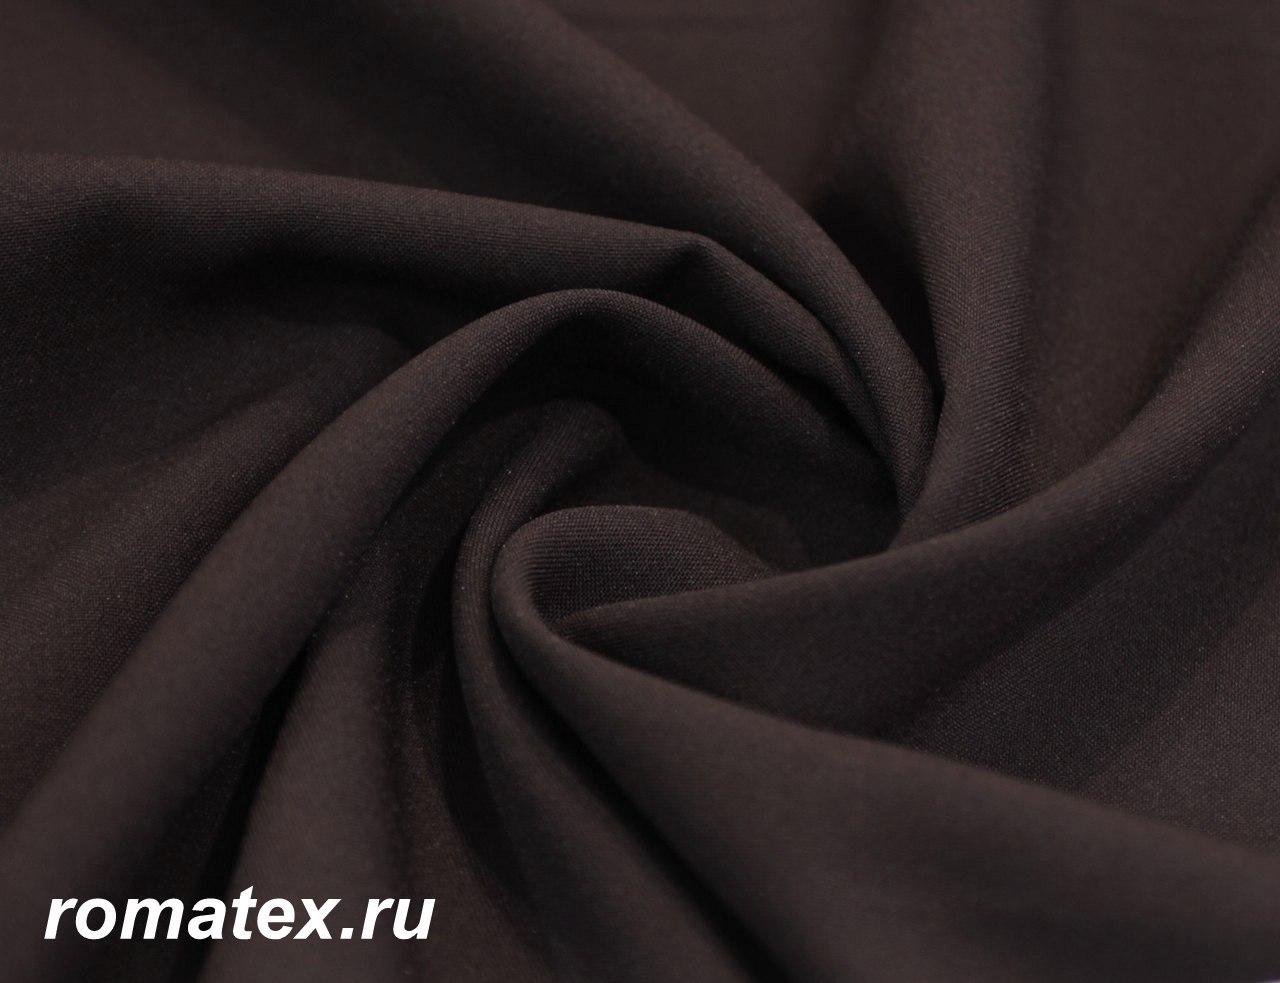 Габардин цвет коричневый